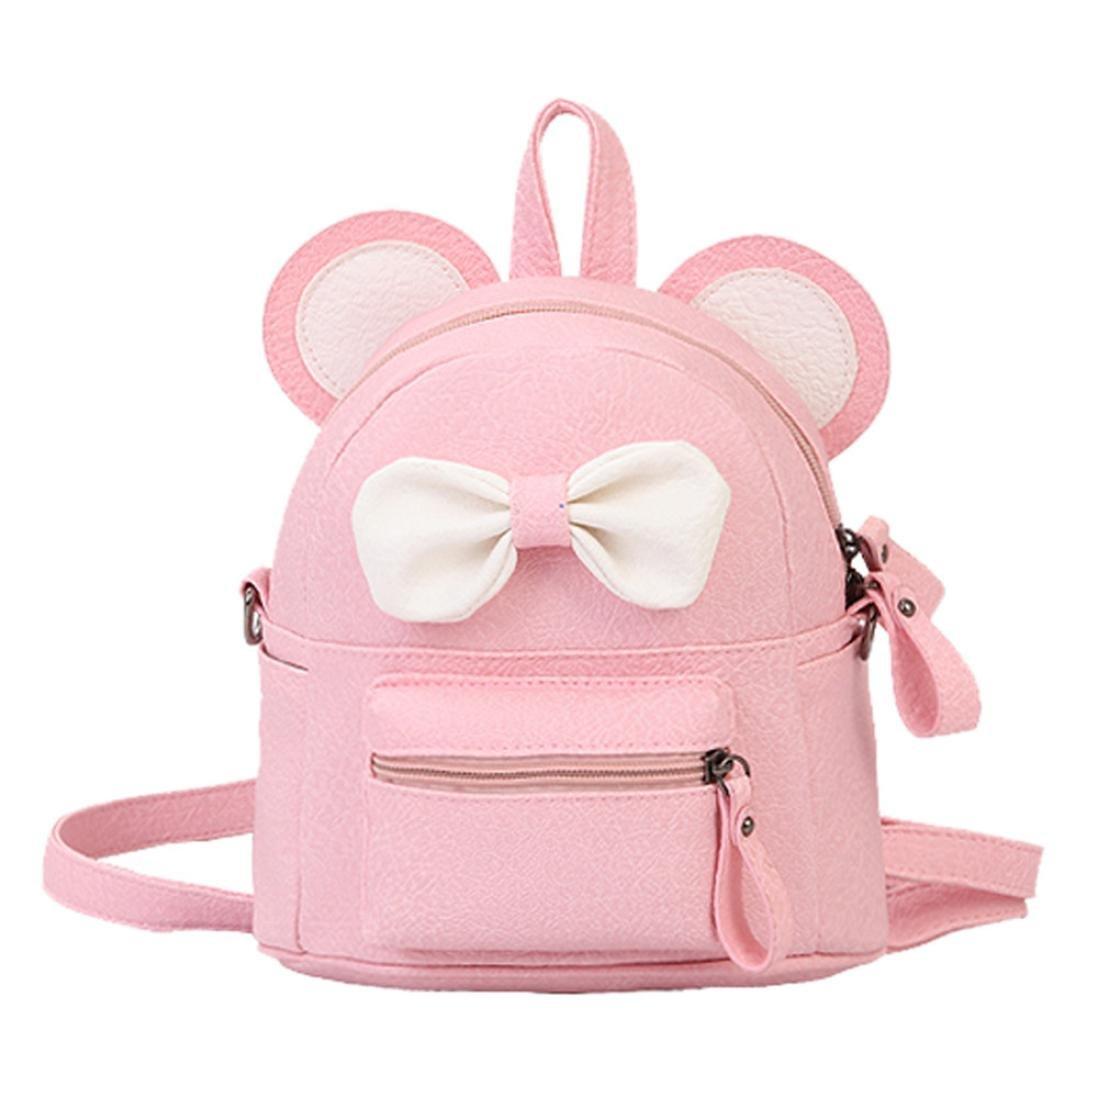 Clearance sale ! Girl Leather School Bag Backpack Satchel Bow Tie Women Trave Shoulder Bag ❤️ ZYEE (Pink, 20cm(L)12cm(W)21cm(H))